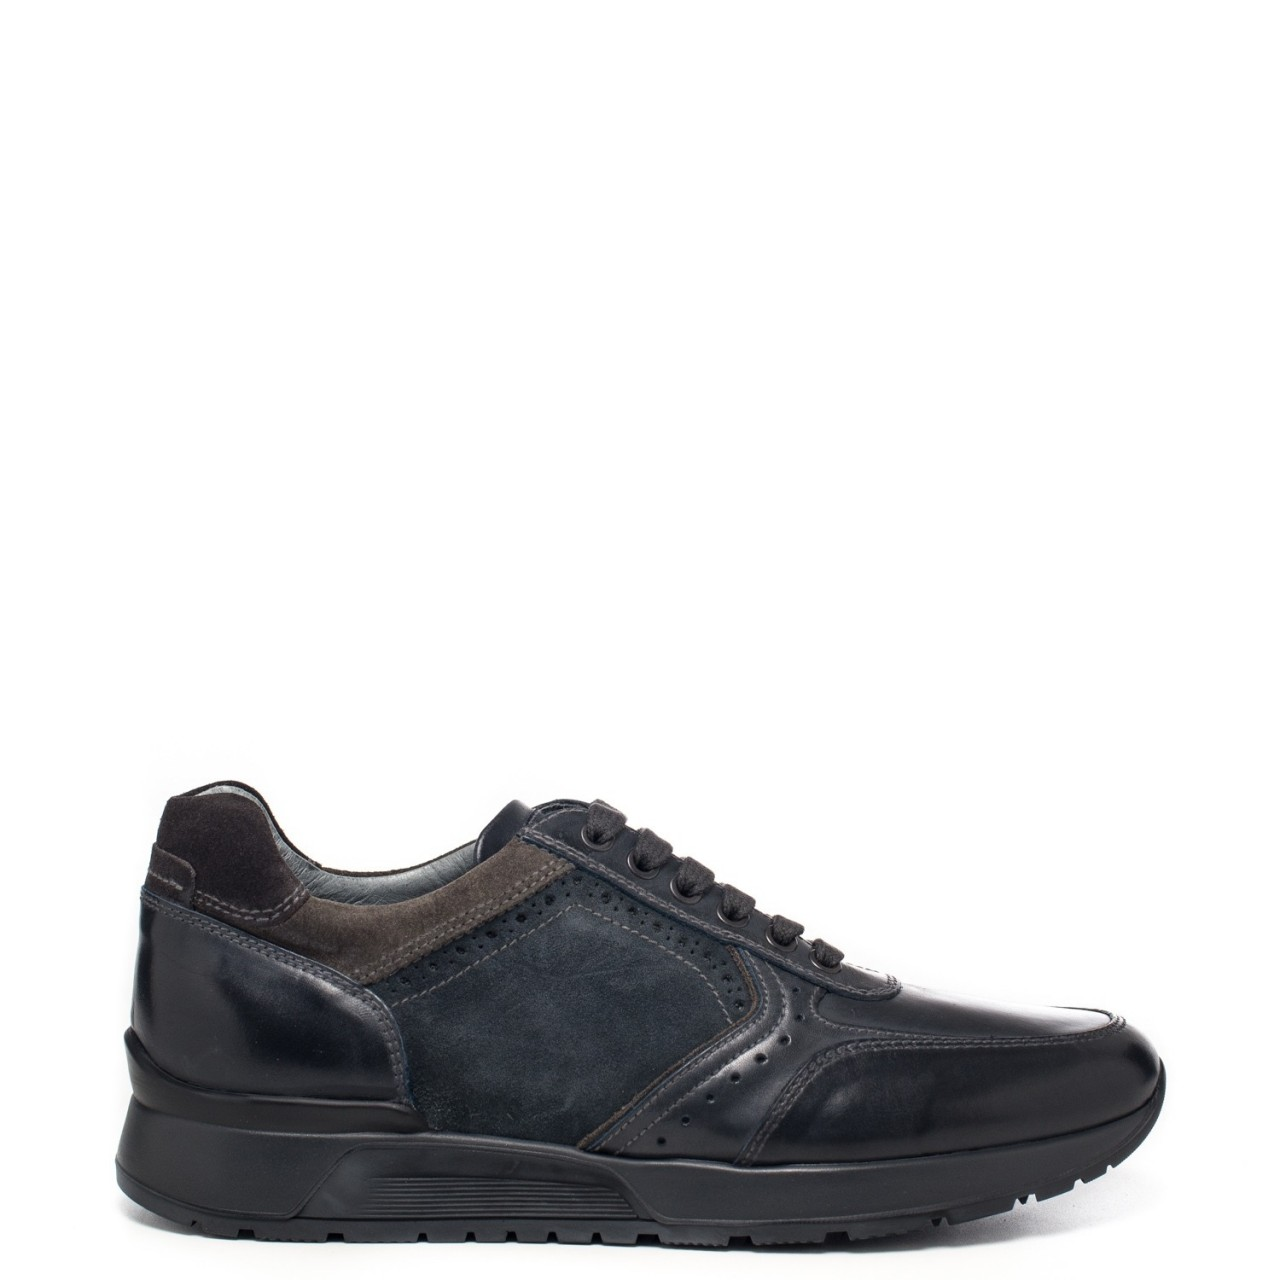 Nero Giardini Sneakers Uomo A800469U 100 - LOMBARDI CALZATURE SEANO ... 0c593095518